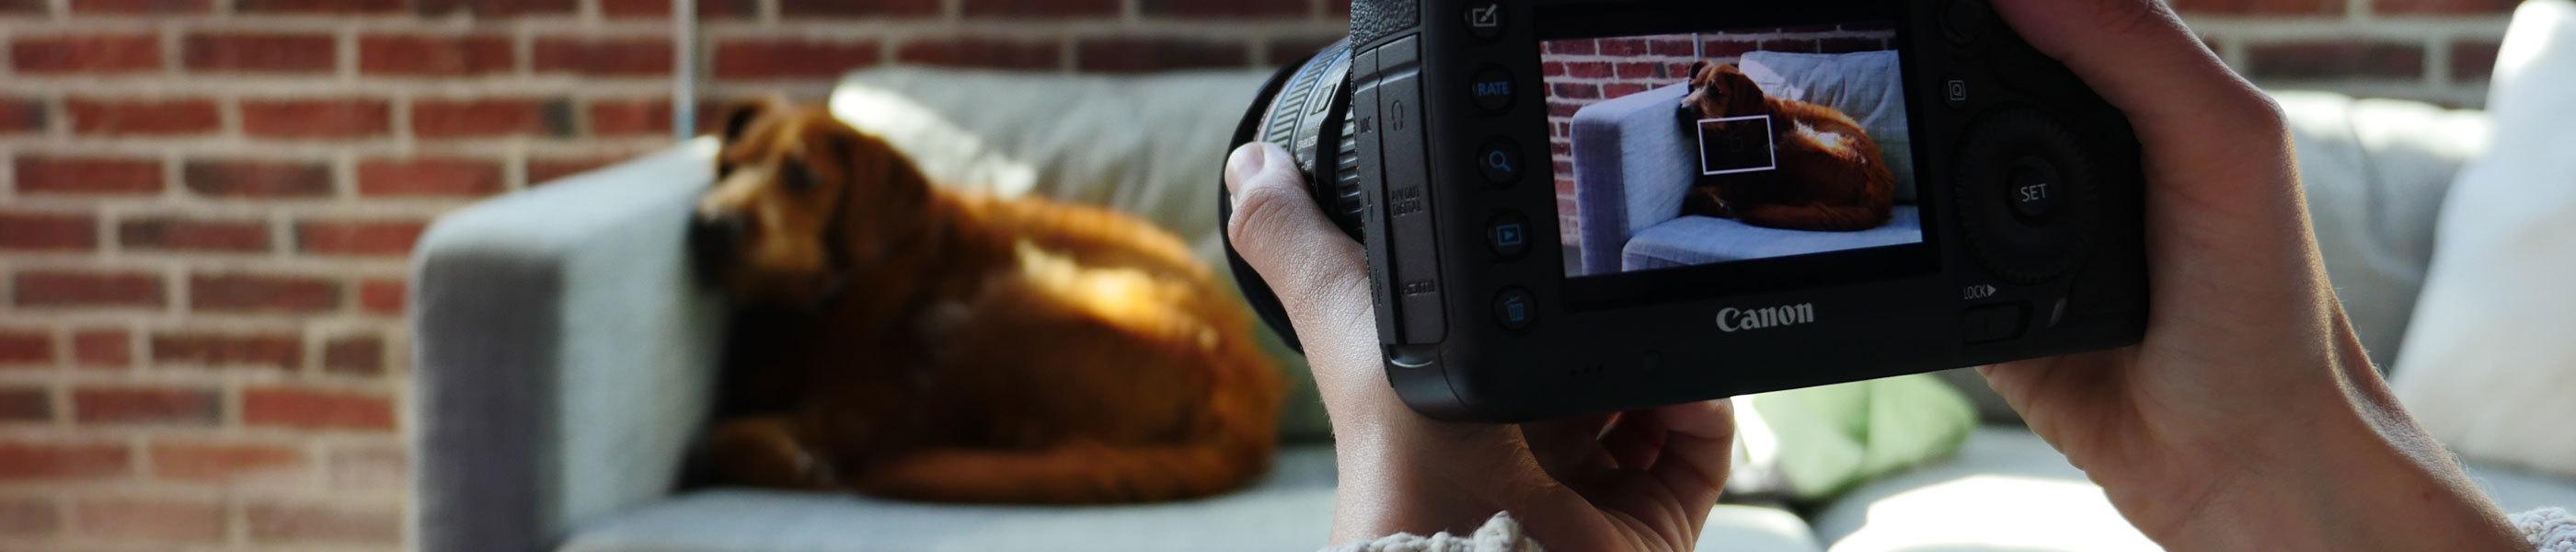 Shooting Stable Handheld Video Footage - Wistia Blog